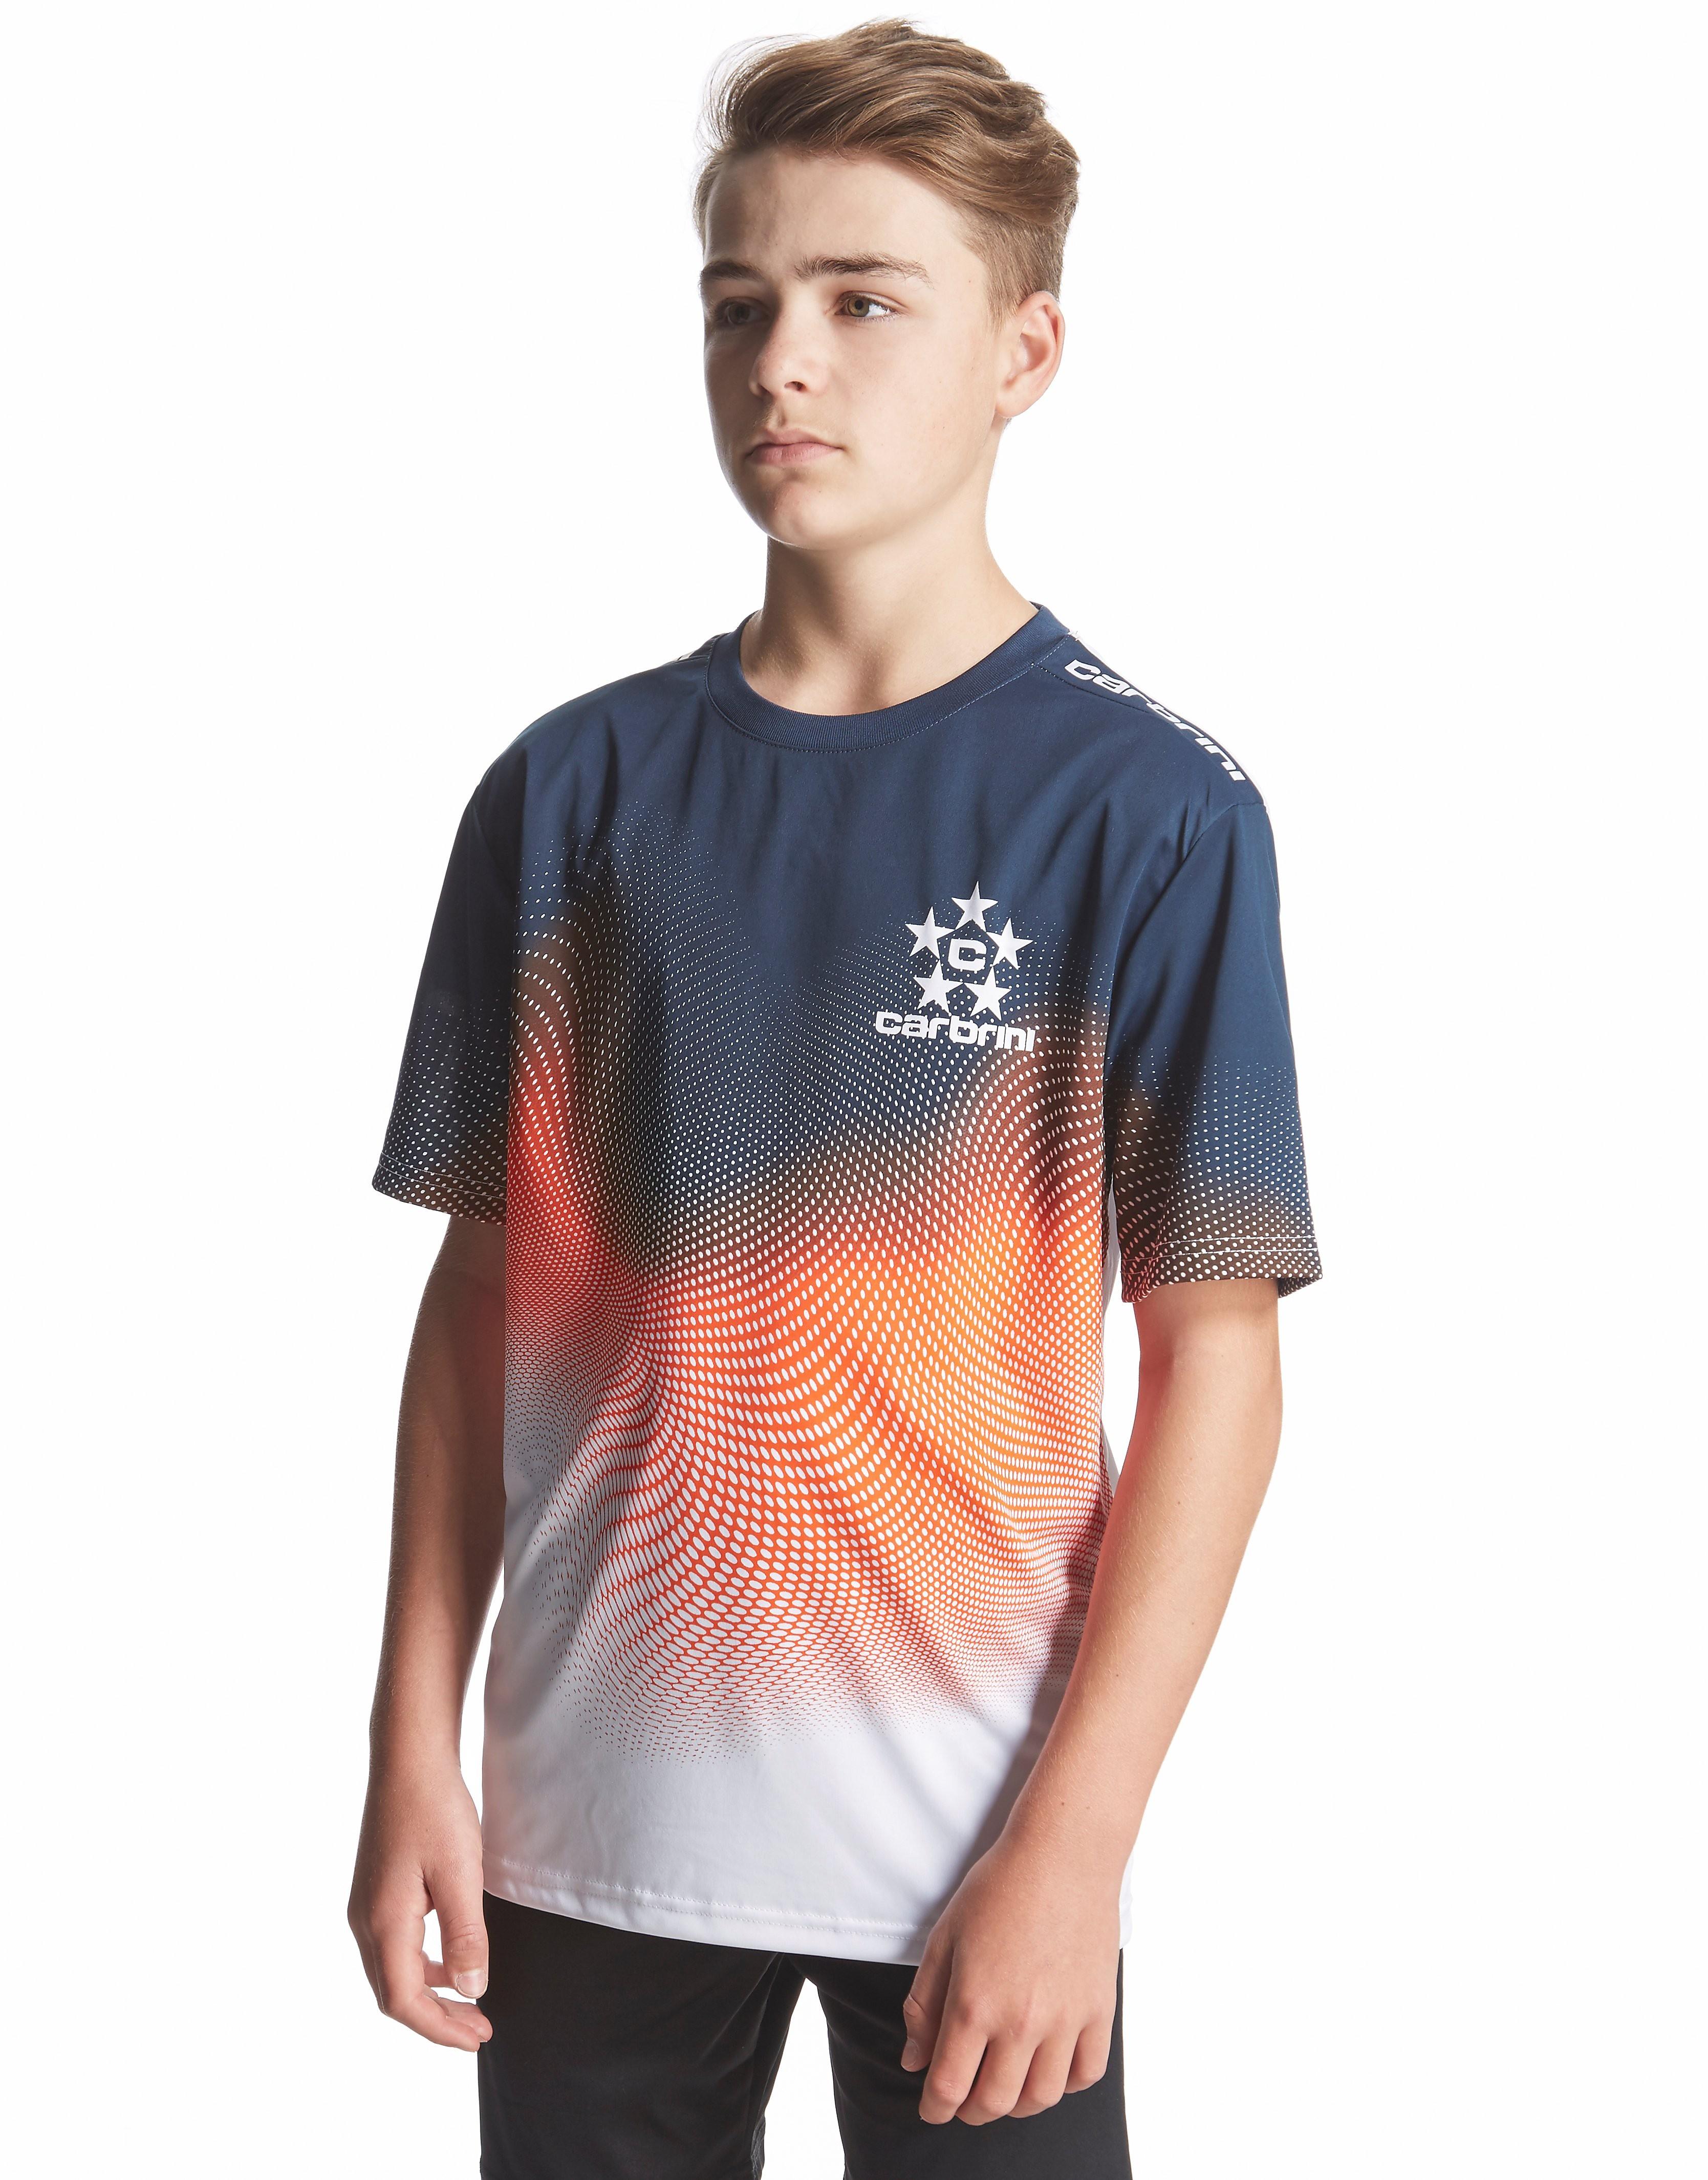 Carbrini Source T-Shirt Junior